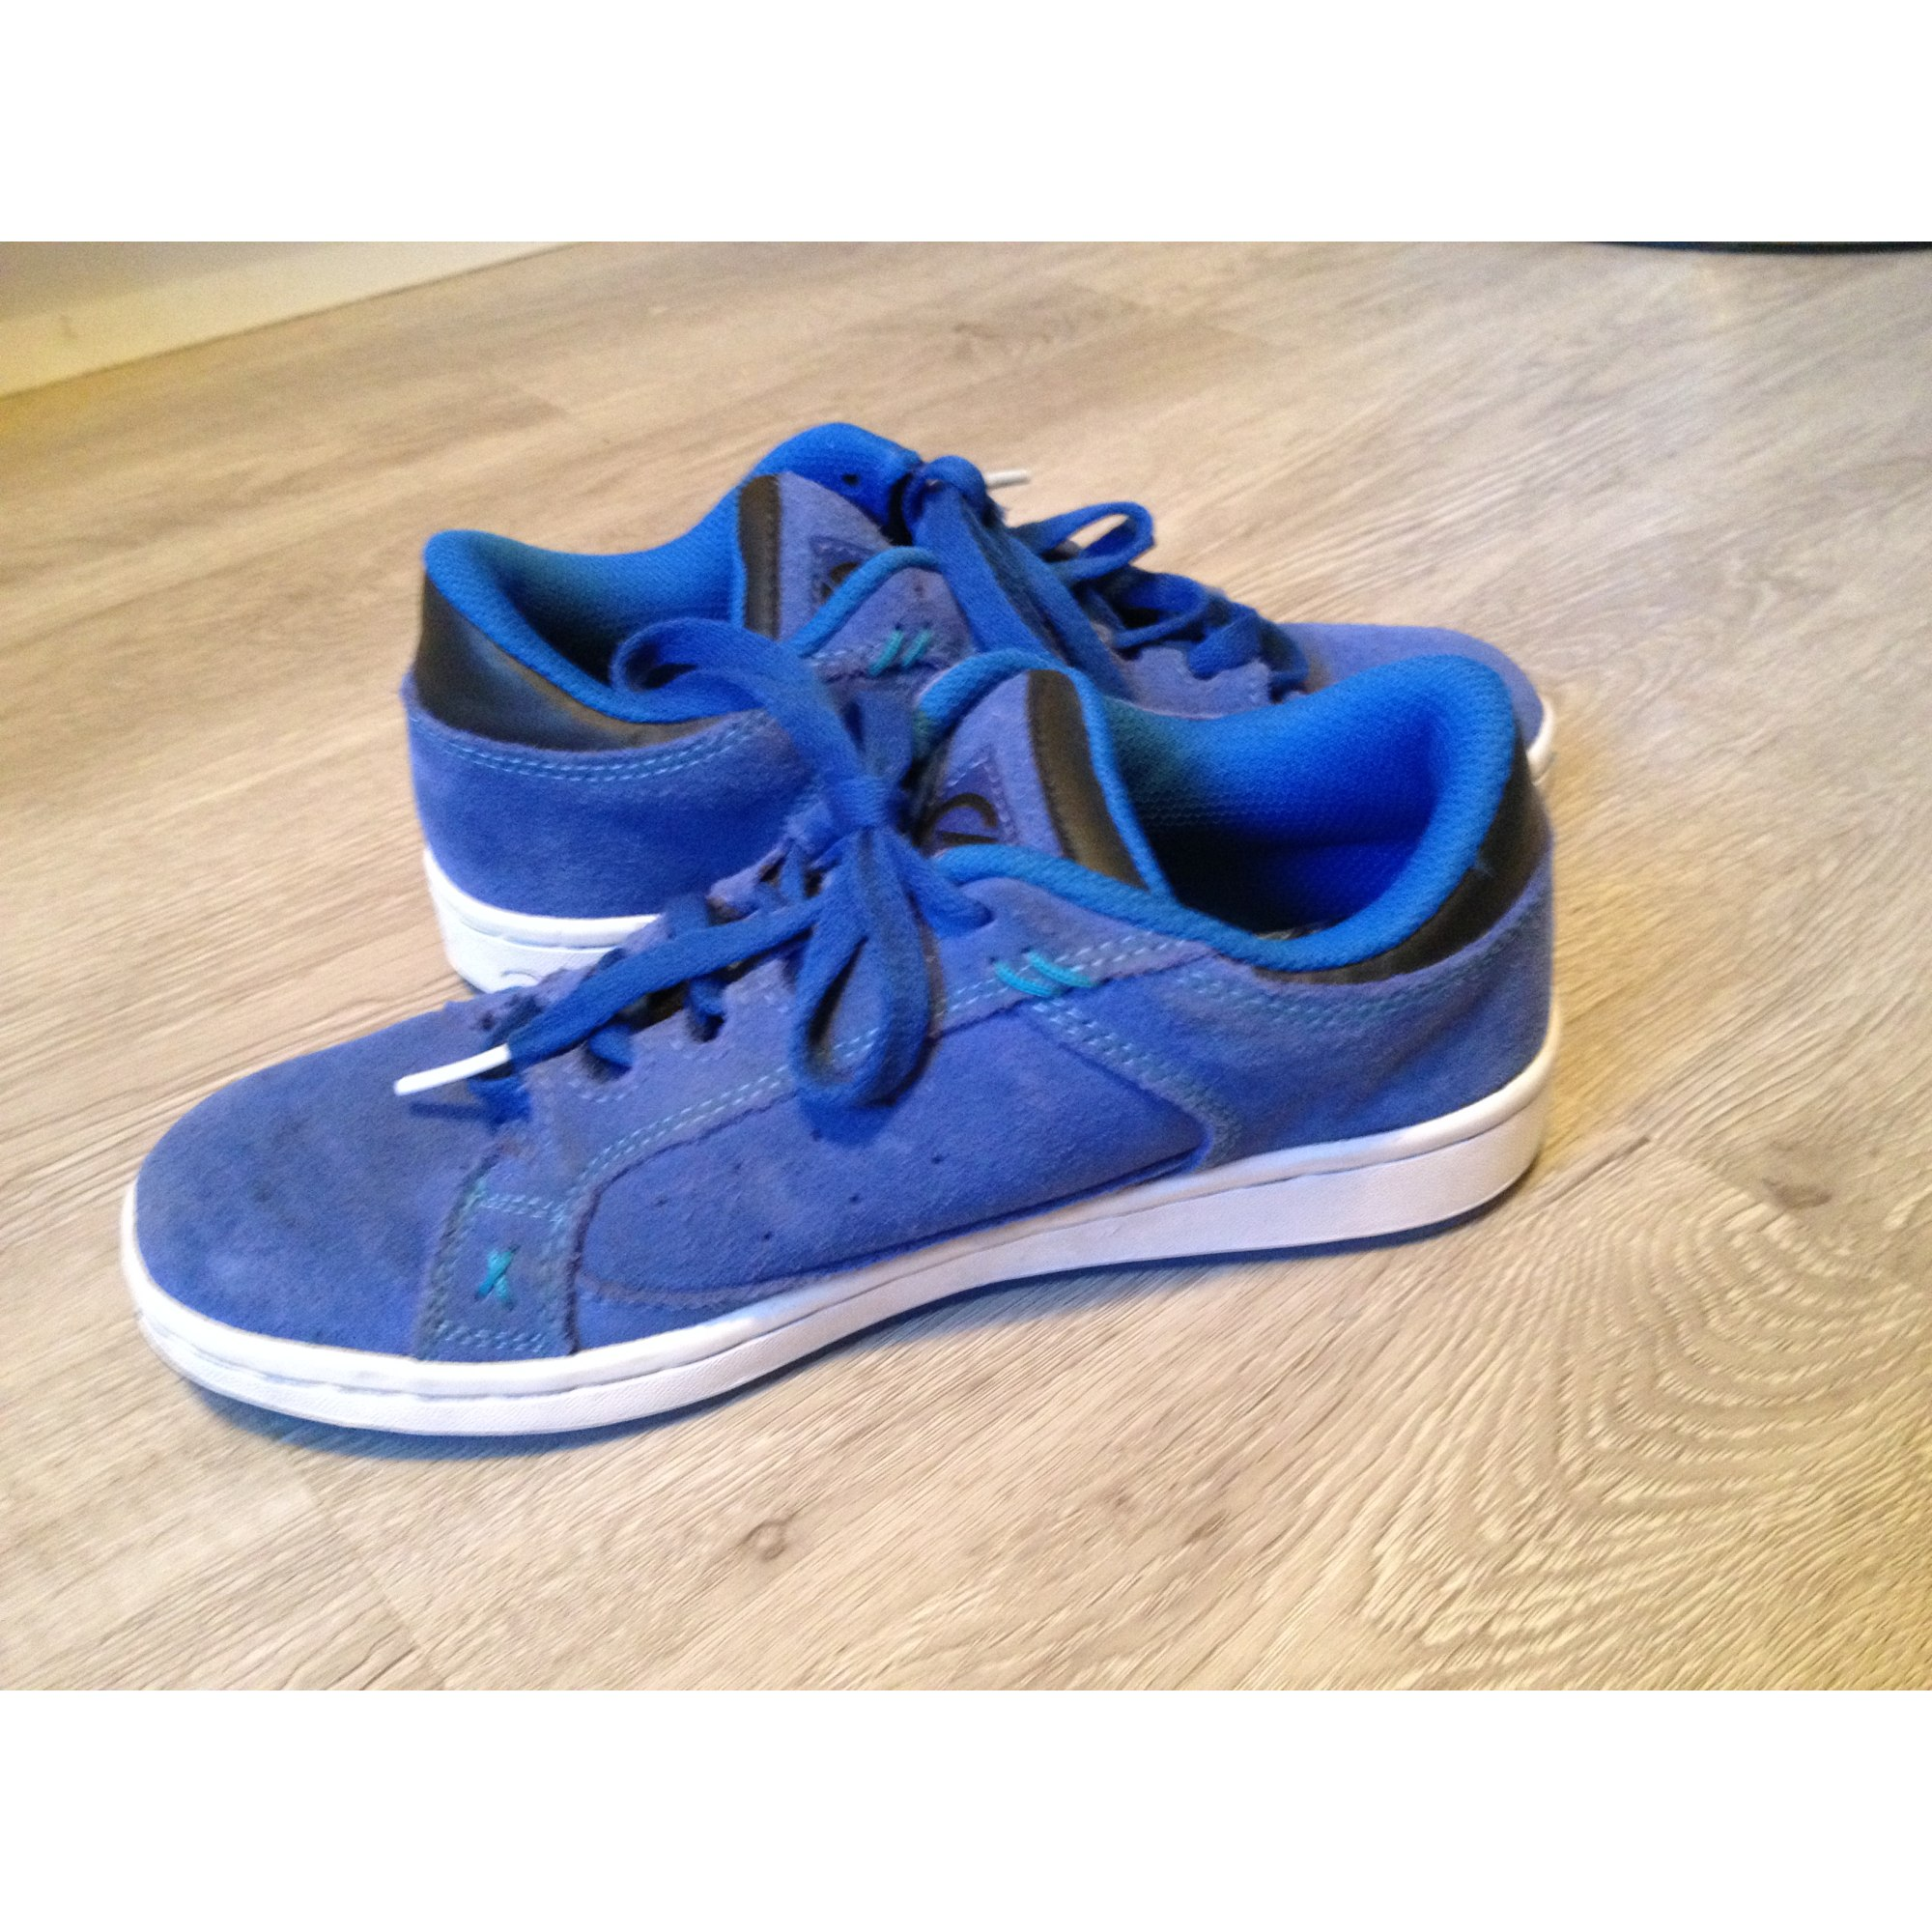 Baskets OXYLANE Bleu, bleu marine, bleu turquoise